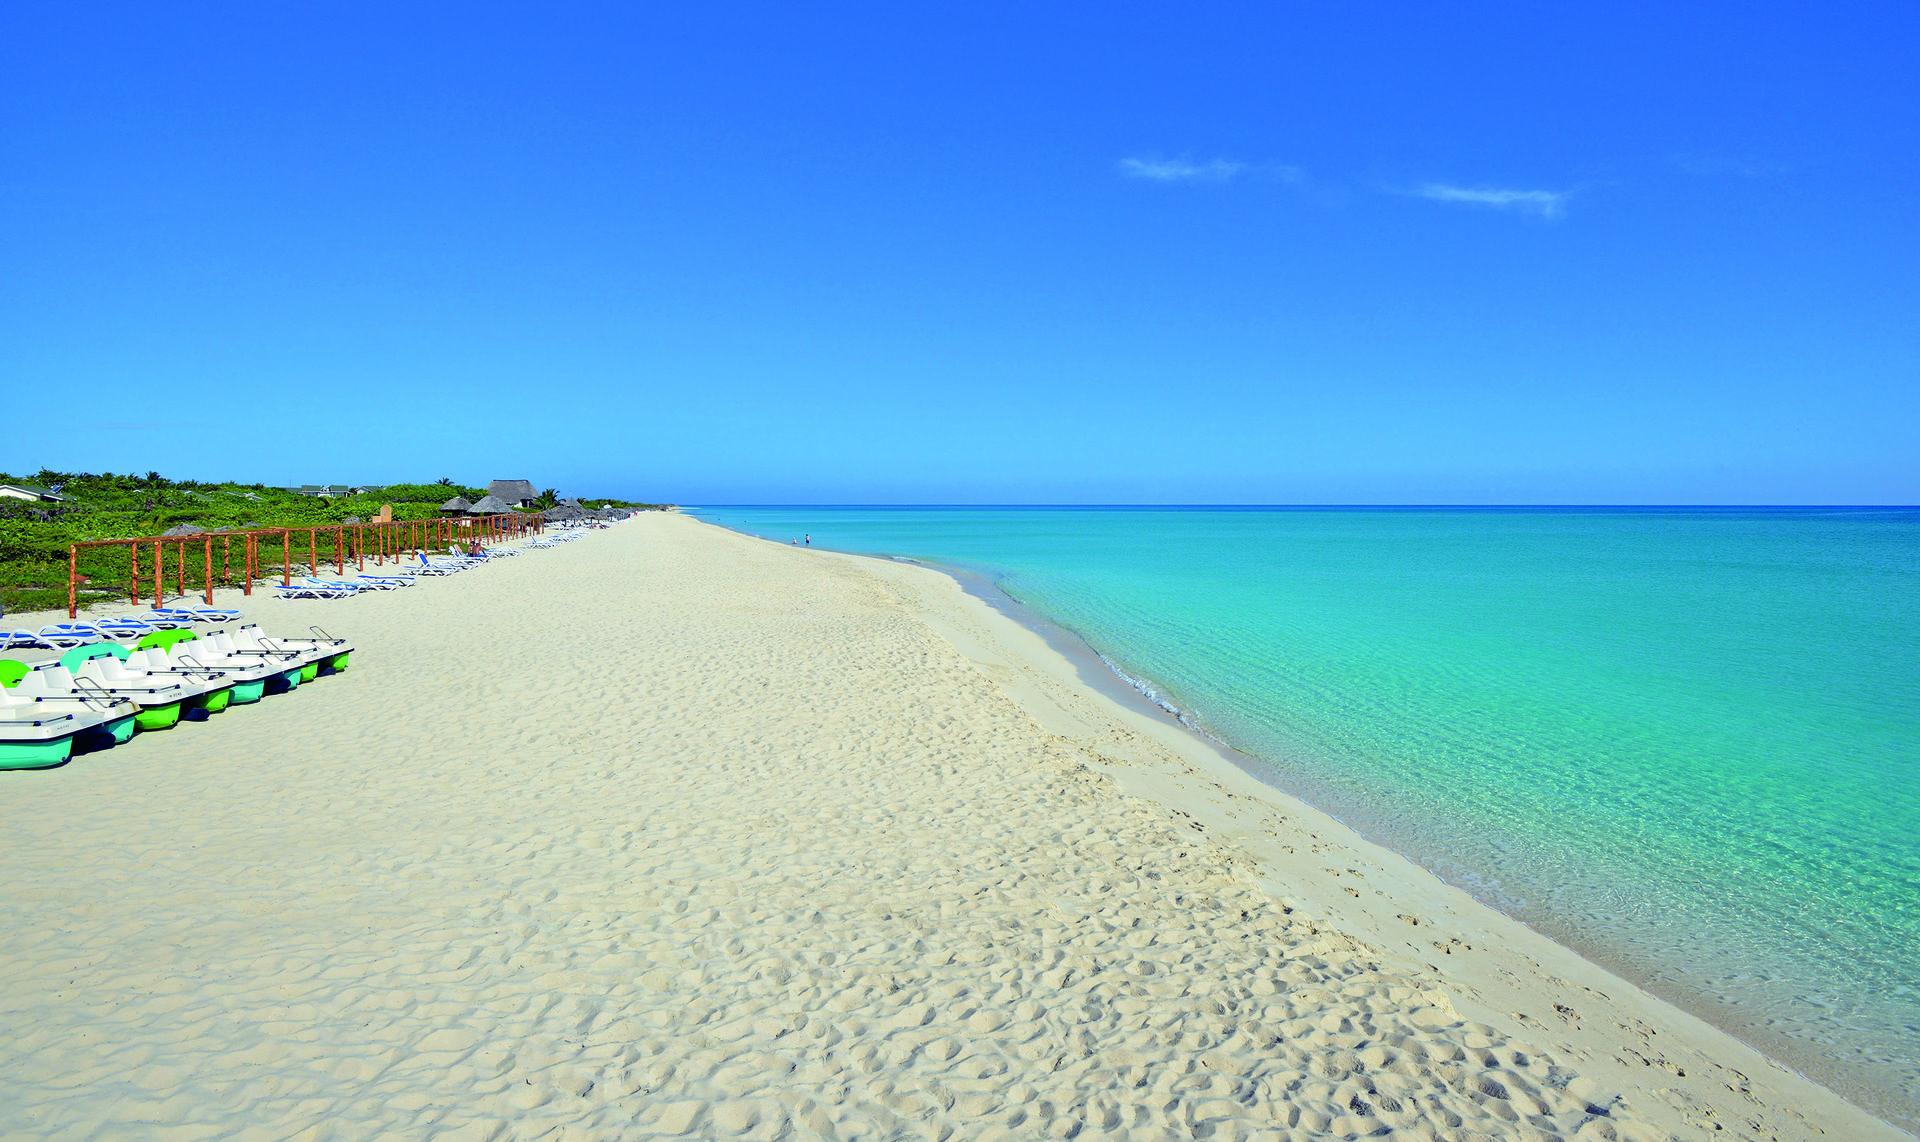 sol-cayosantamaria-playa-10205